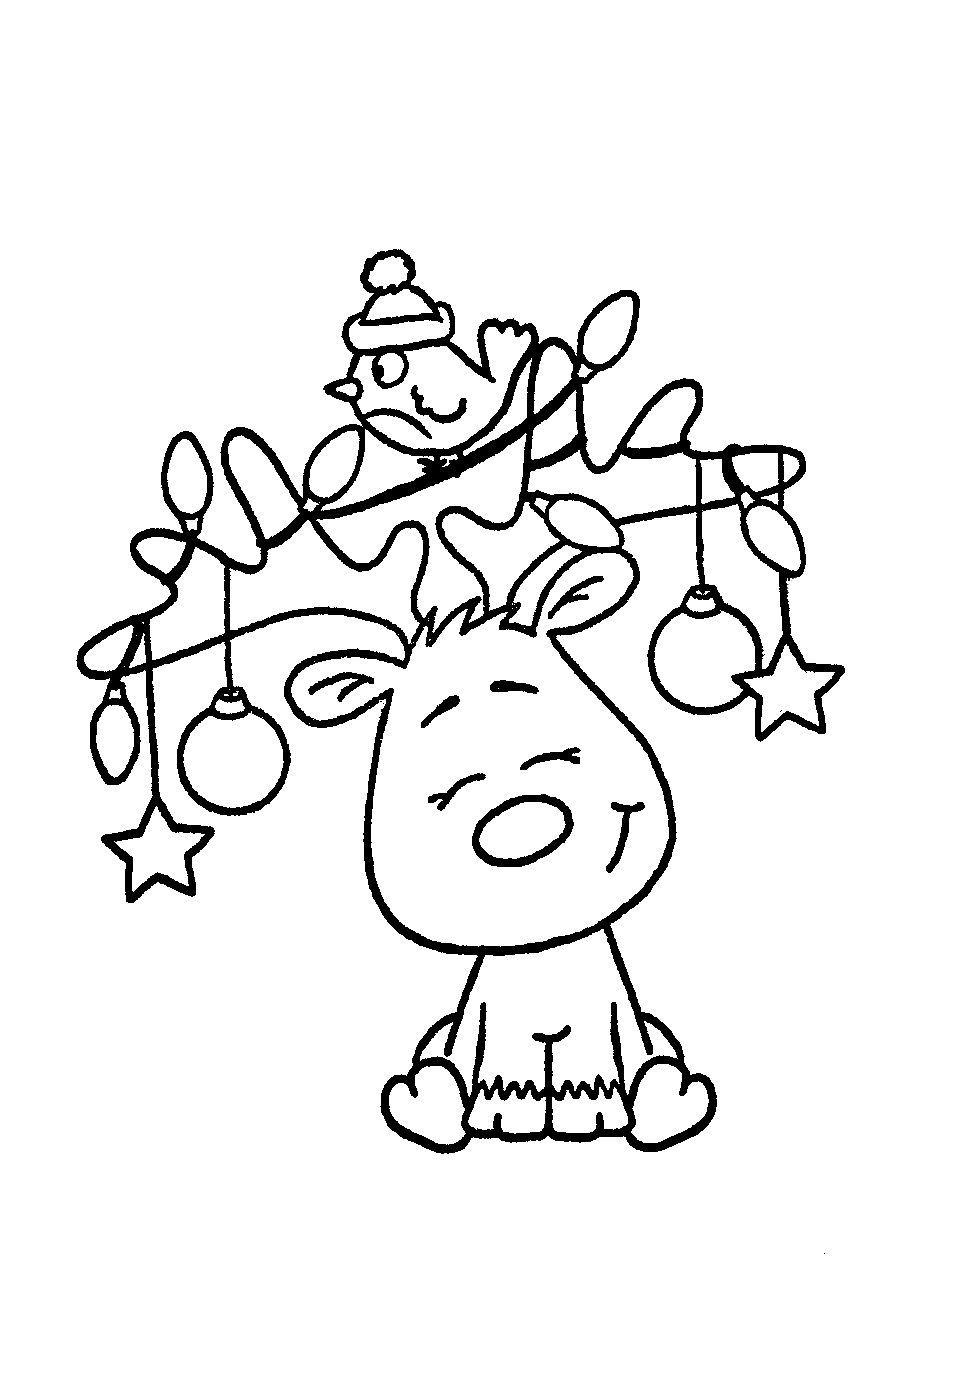 Weihnachtselch Ausmalbilder Christmas Coloring Sheets Christmas Coloring Pages Christmas Drawing